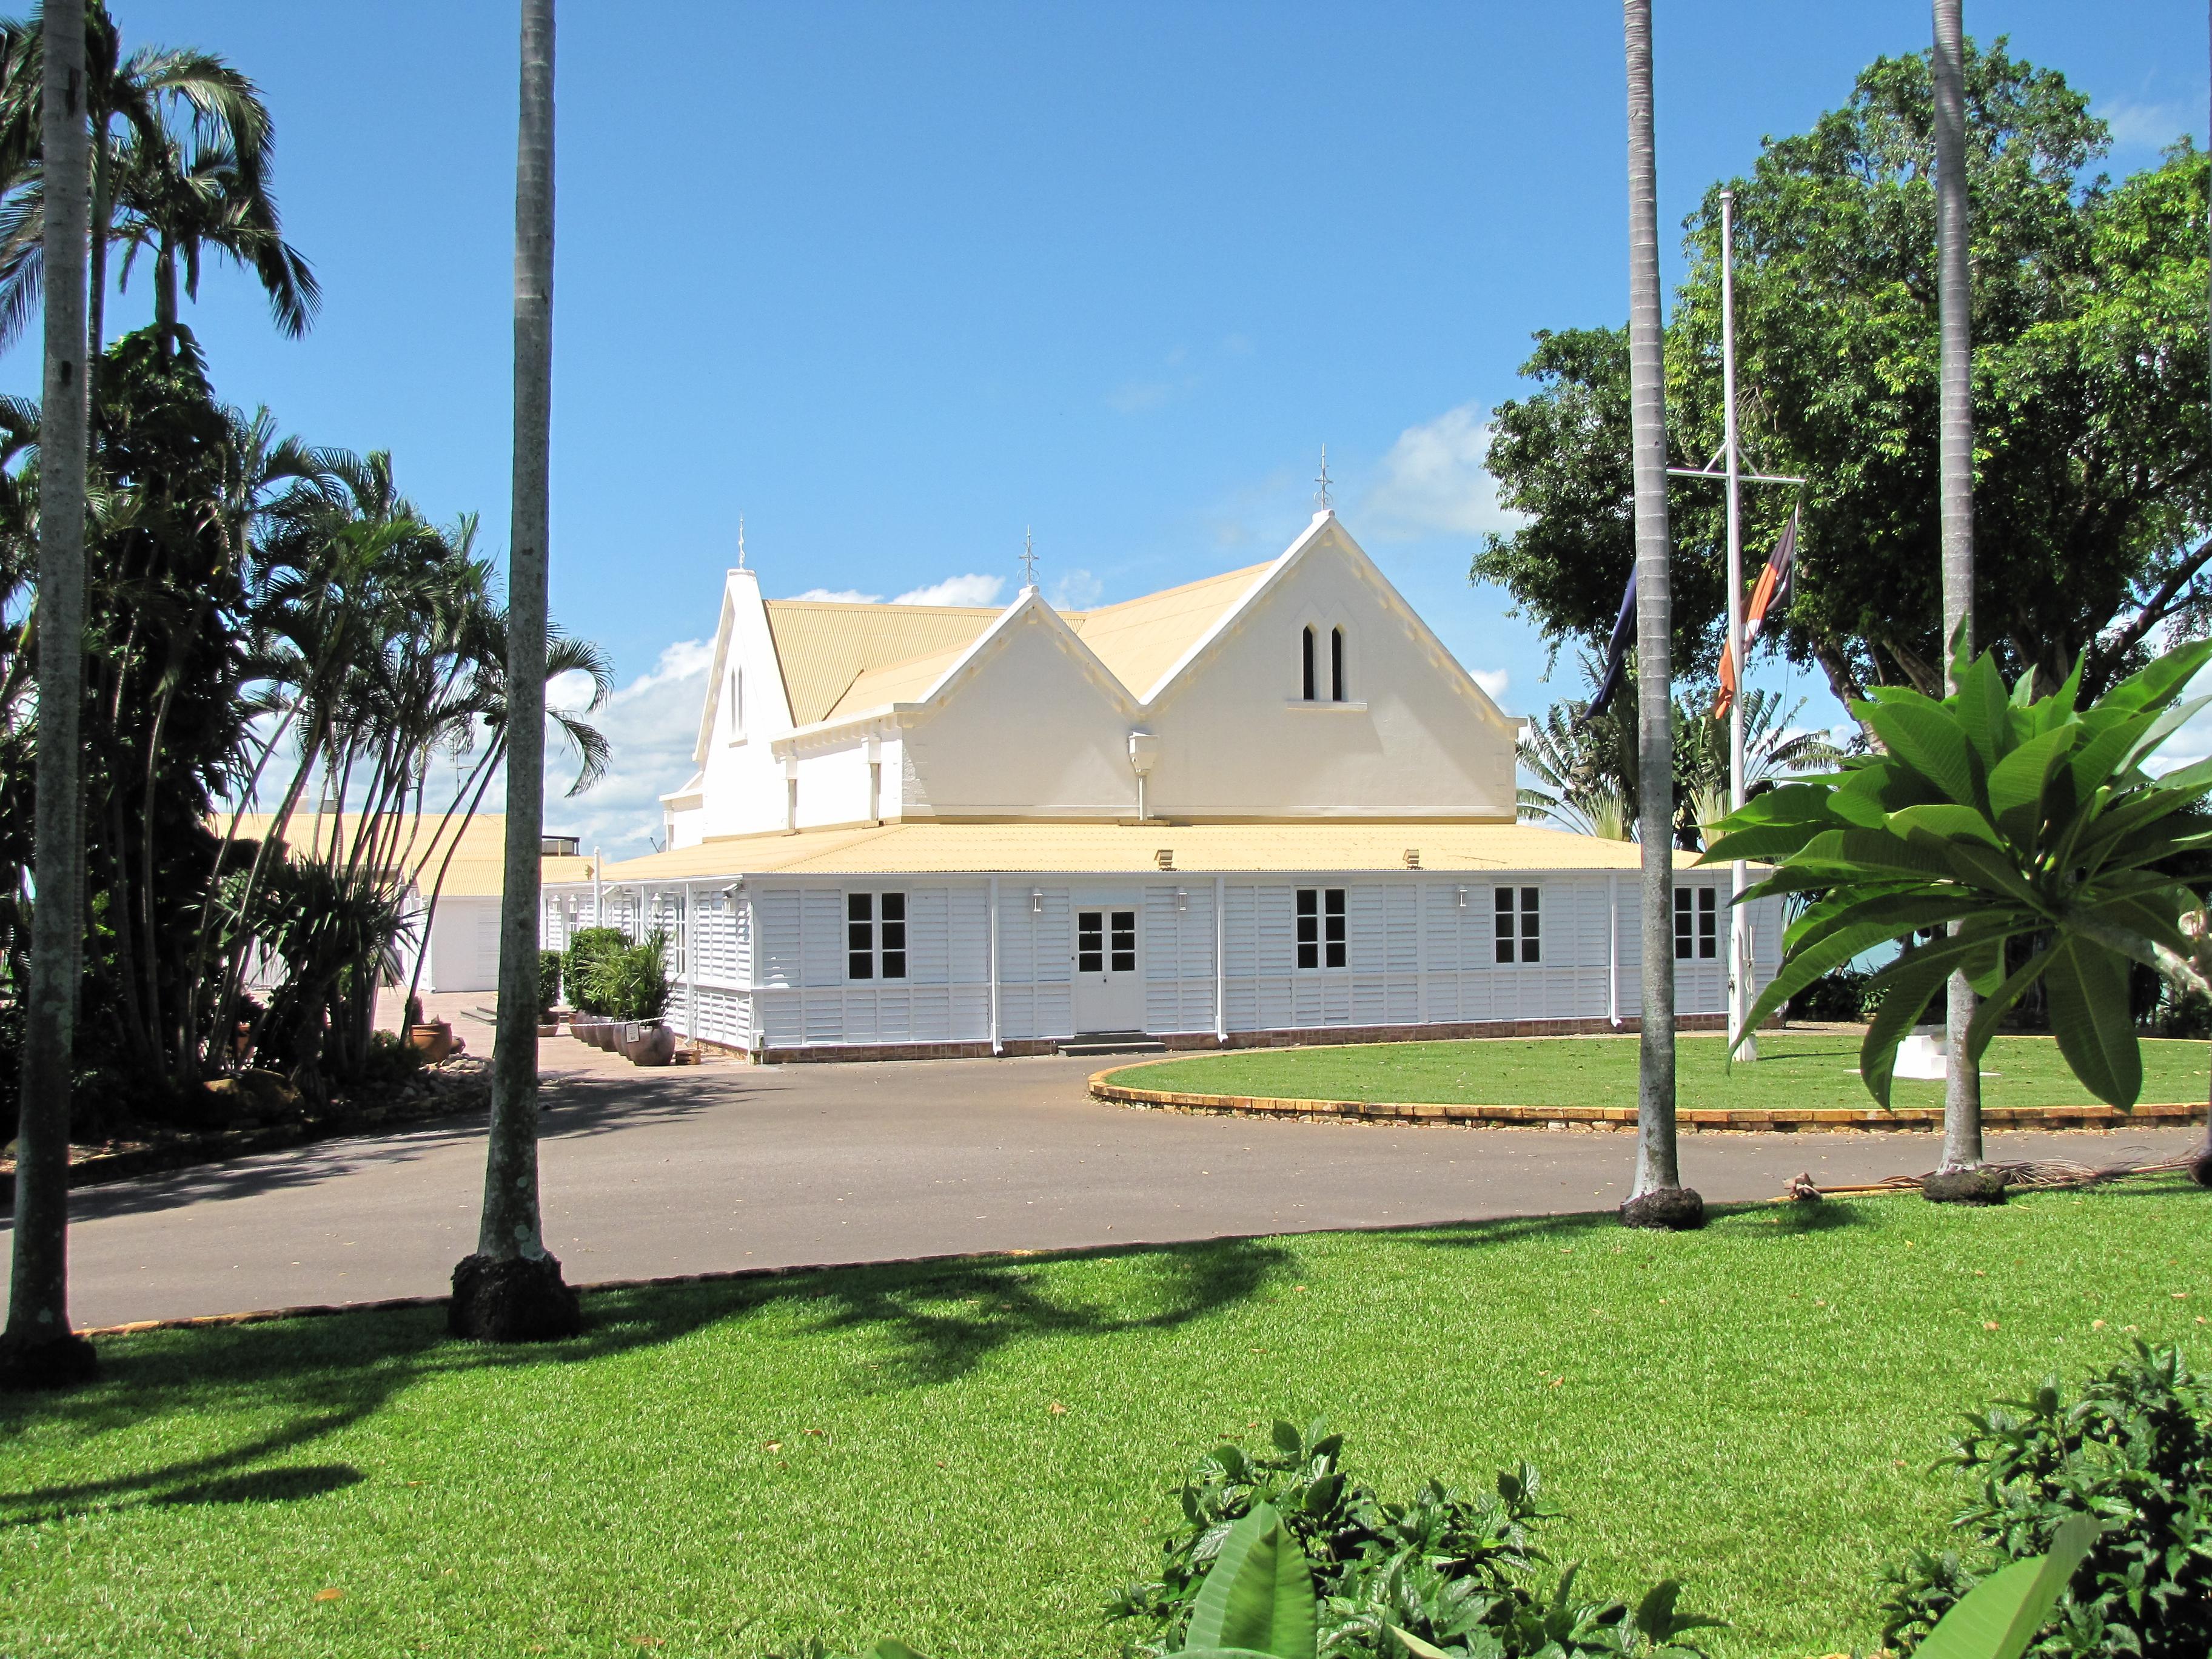 File:Government House, Darwin.jpg - Wikimedia Commons